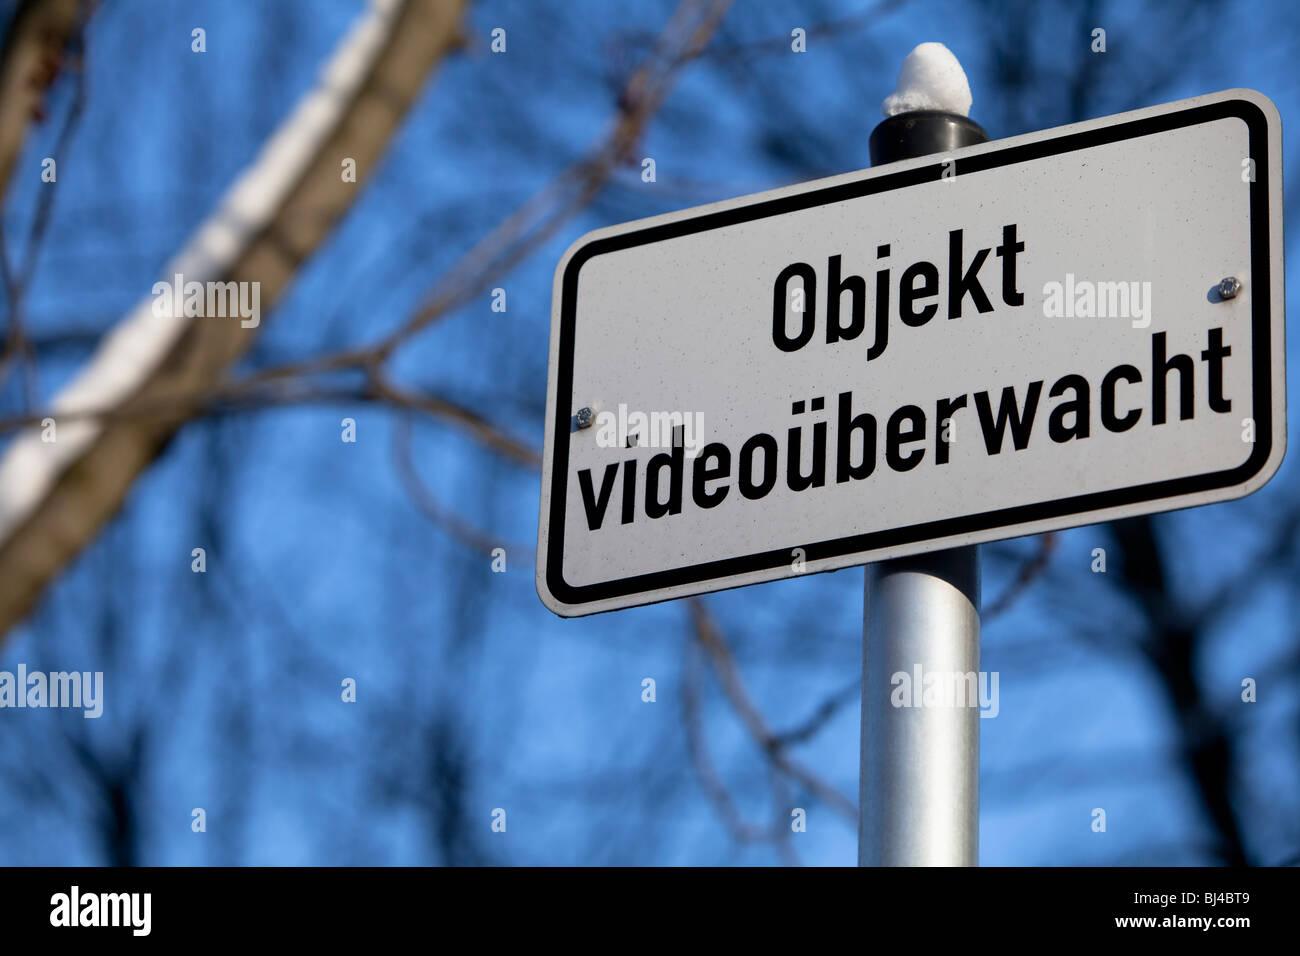 Sign 'Objekt videoueberwacht', CCTV used here - Stock Image